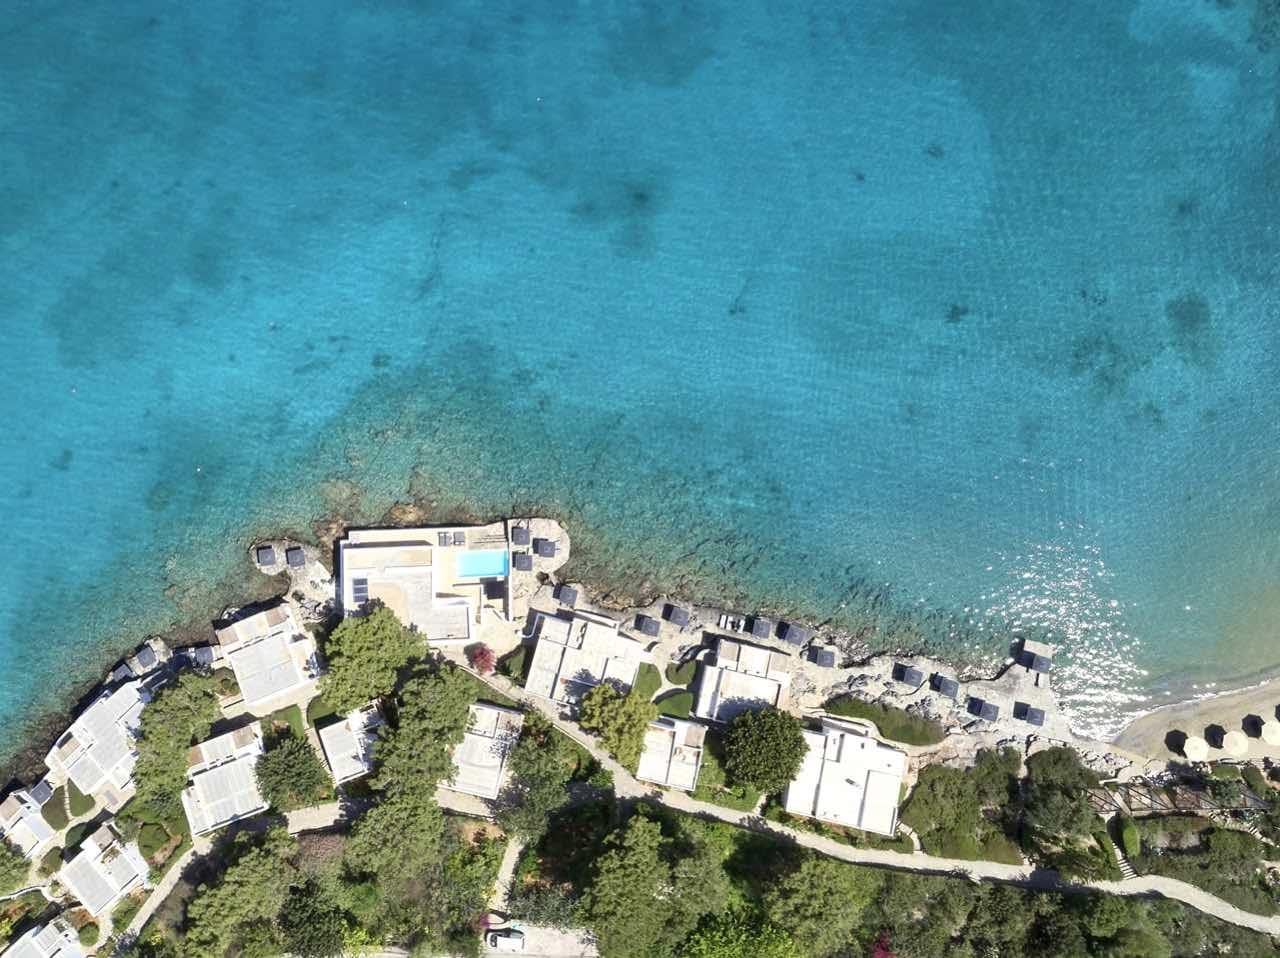 Minos Beach Art Hotel Luxurious Stay In Minimalist Surroundings